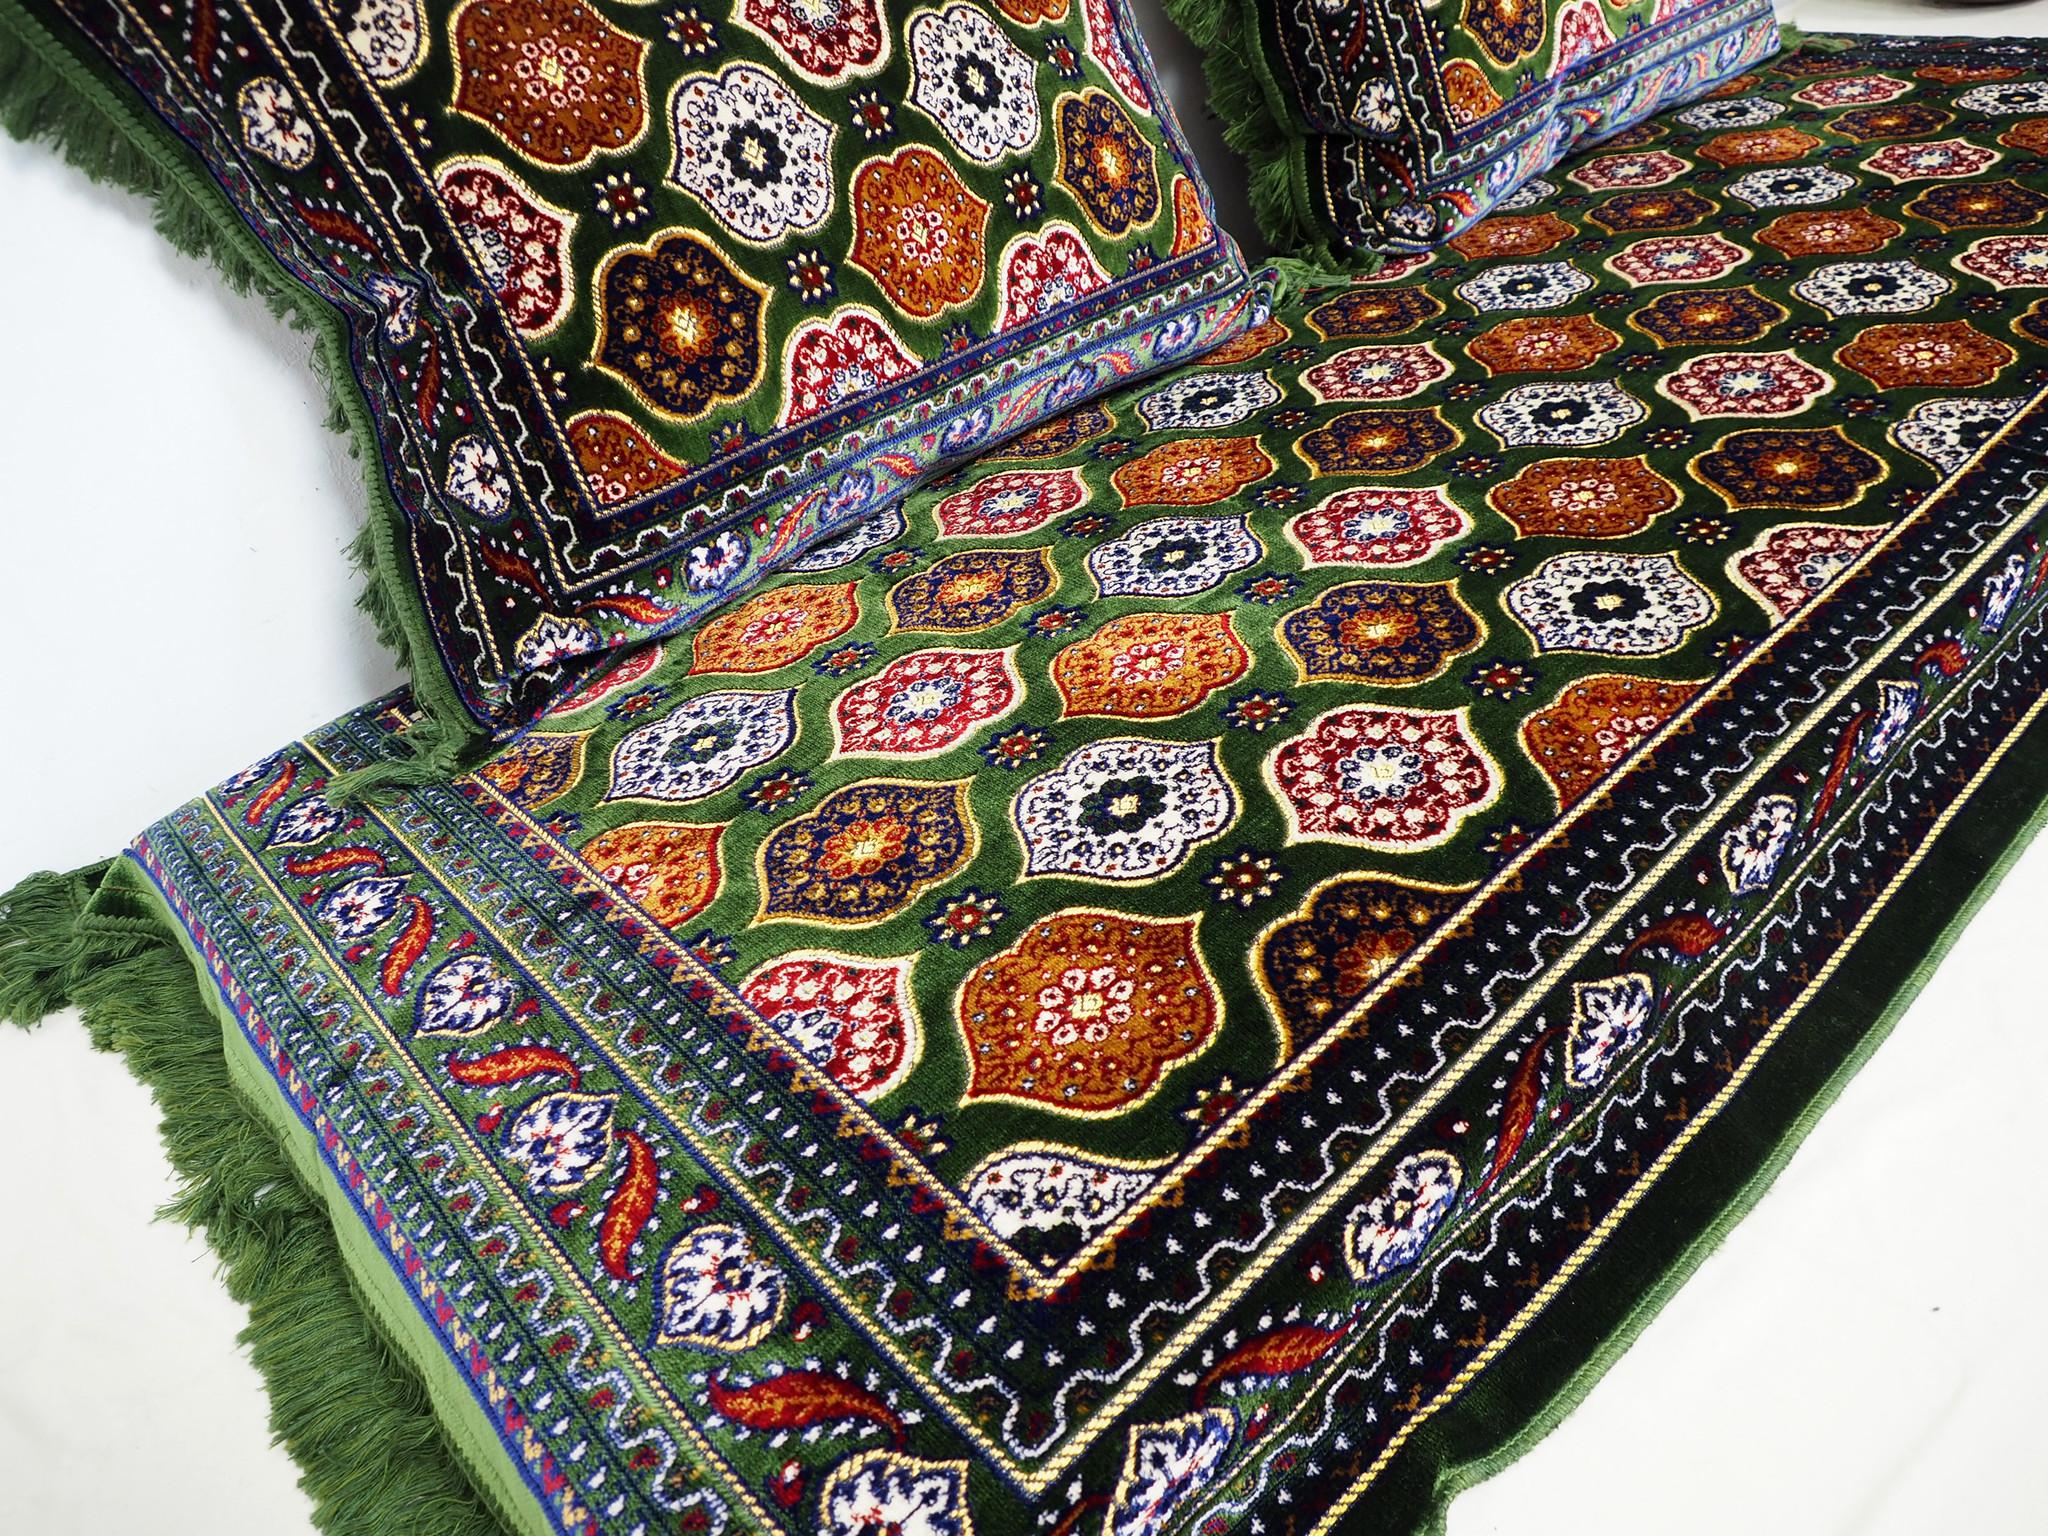 190x75 orient Sitzkissen Matratze Sitzecke Afghan toshak seating mattress (Grün) توشک   - Copy